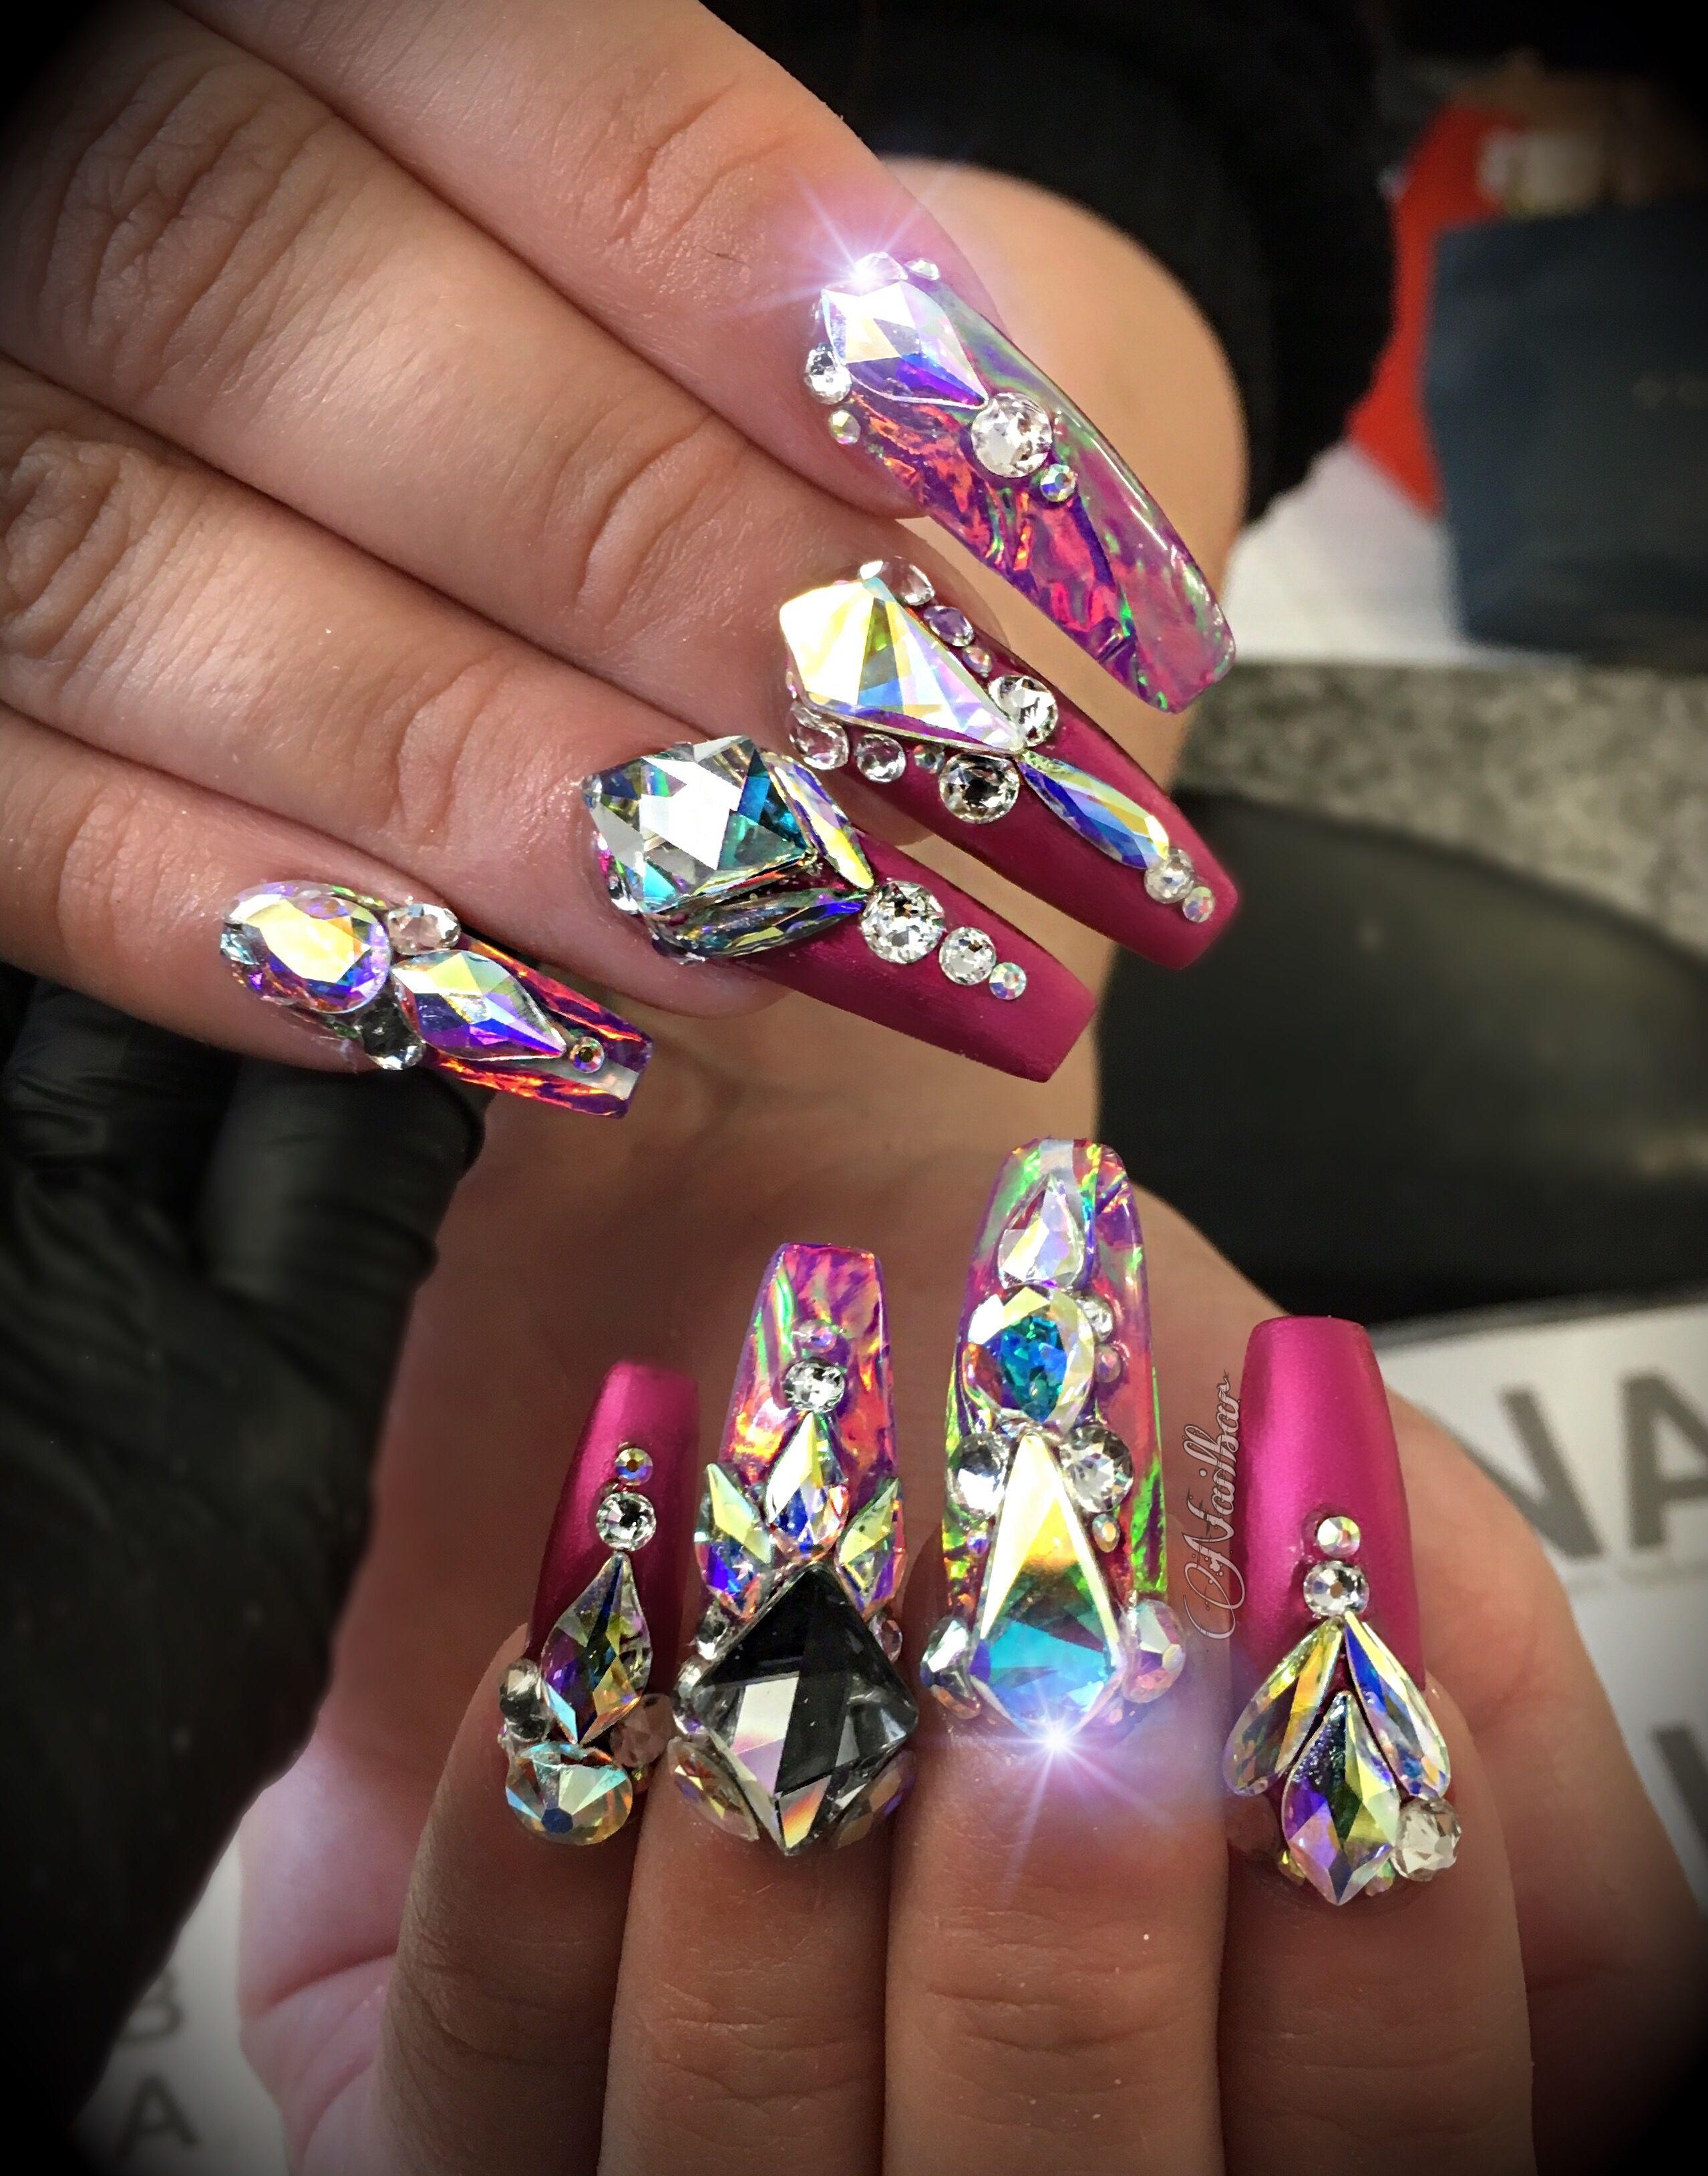 Pin by ilovedarren23 hes my husband on Nails | Pinterest | Beautiful ...